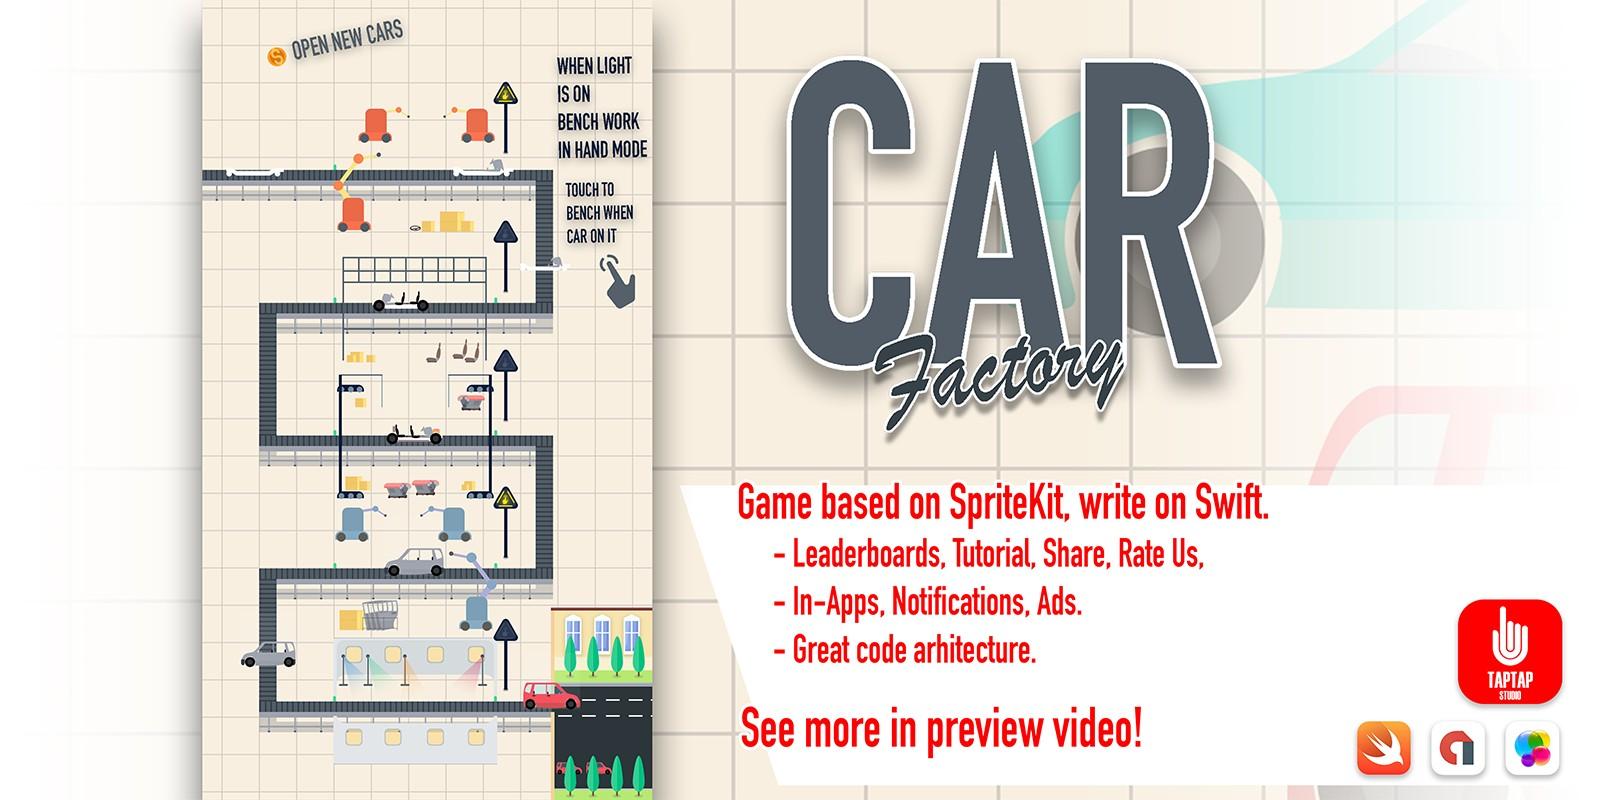 Car Factory - iOS Source Code